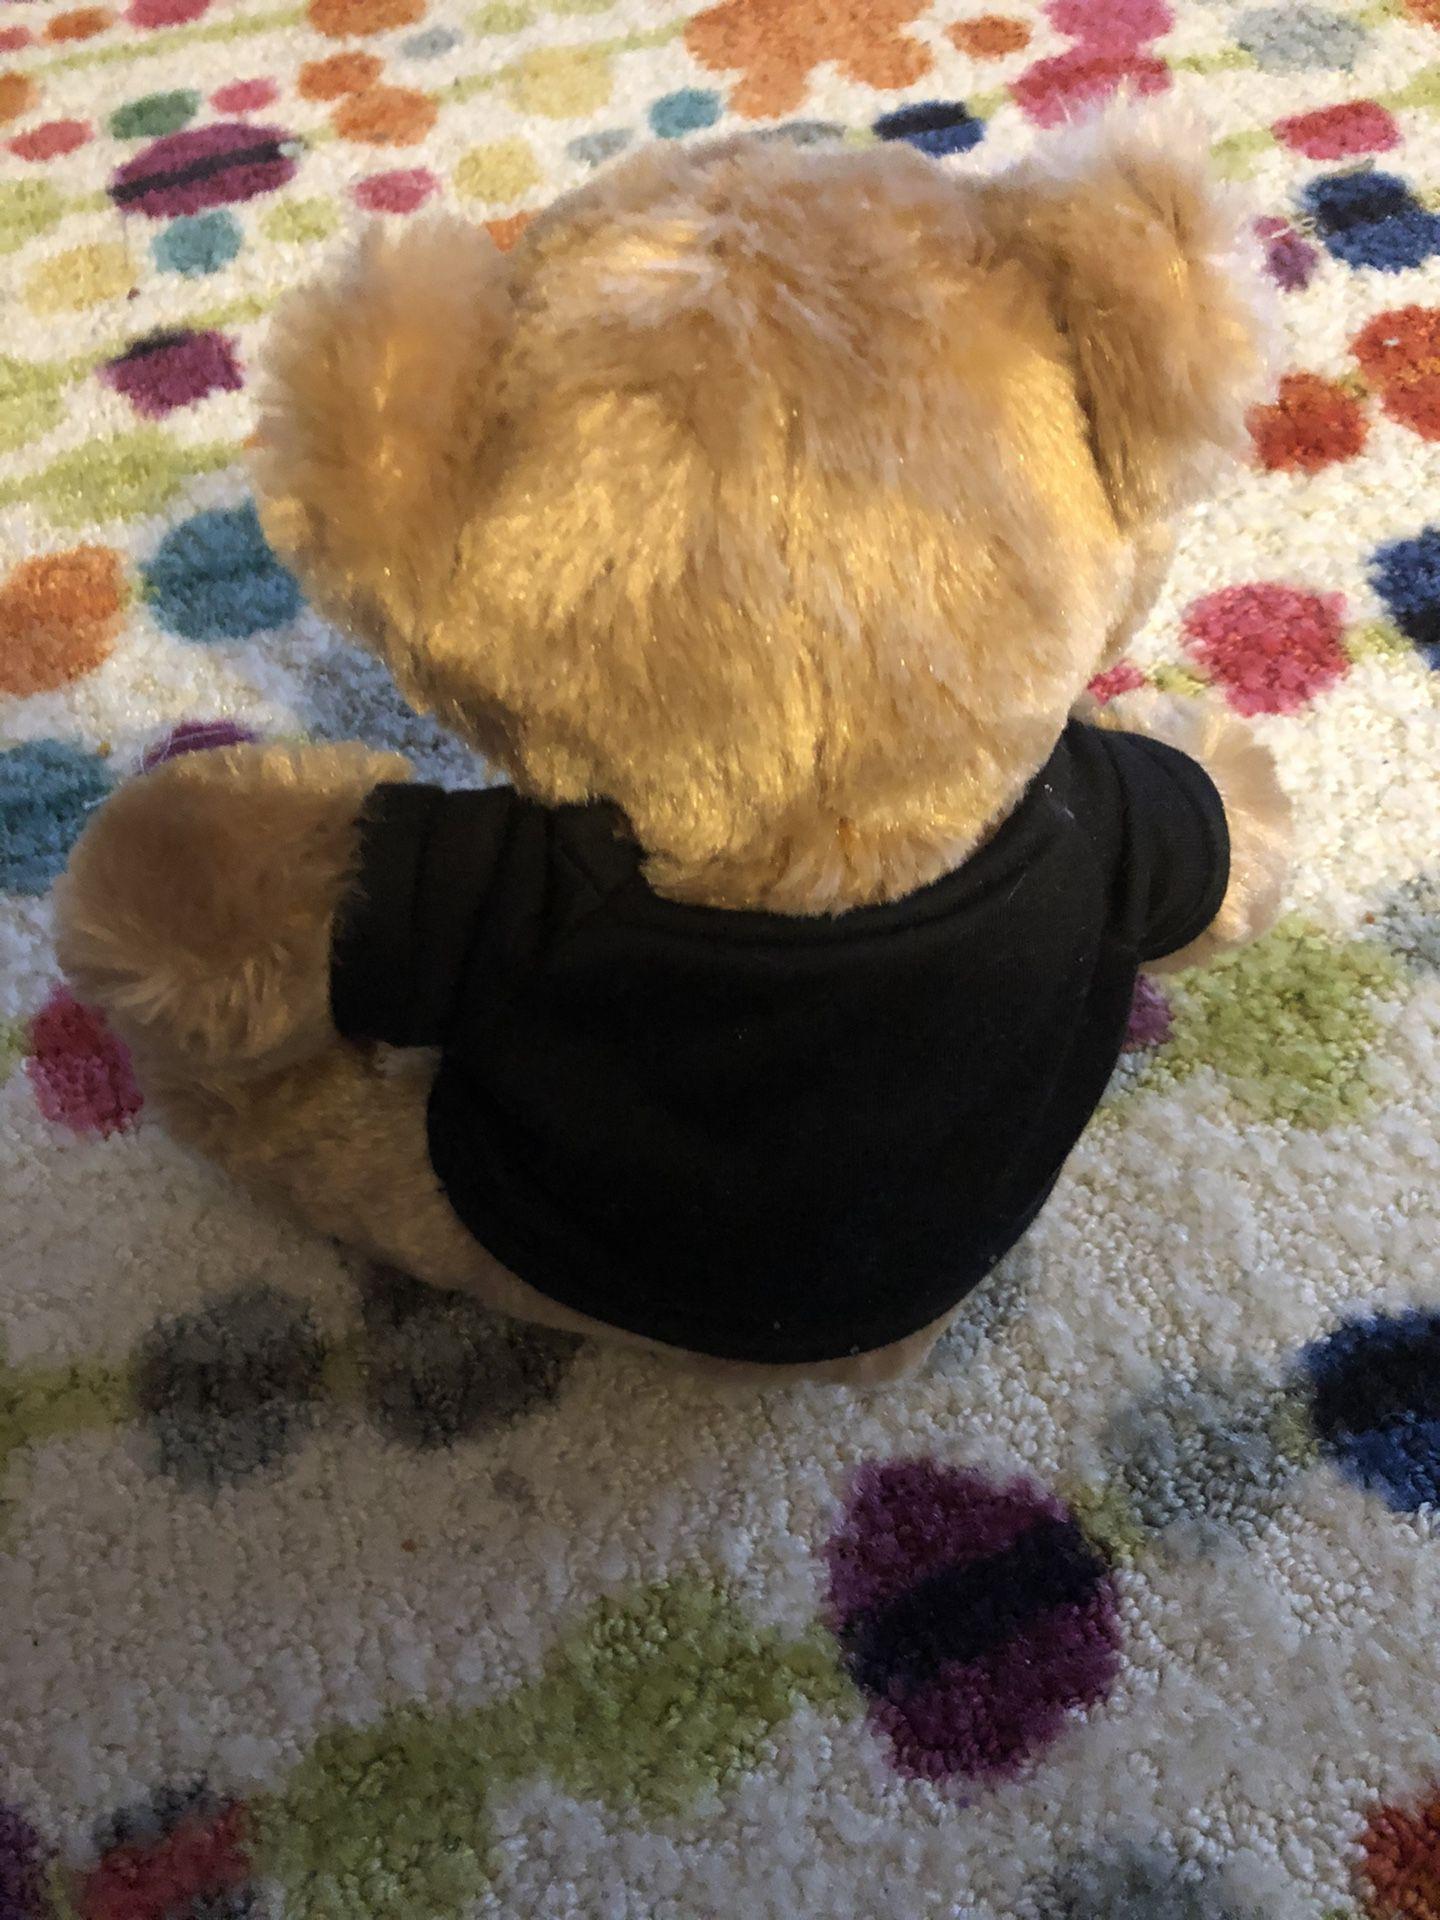 Hitwear teddybear excellent condition